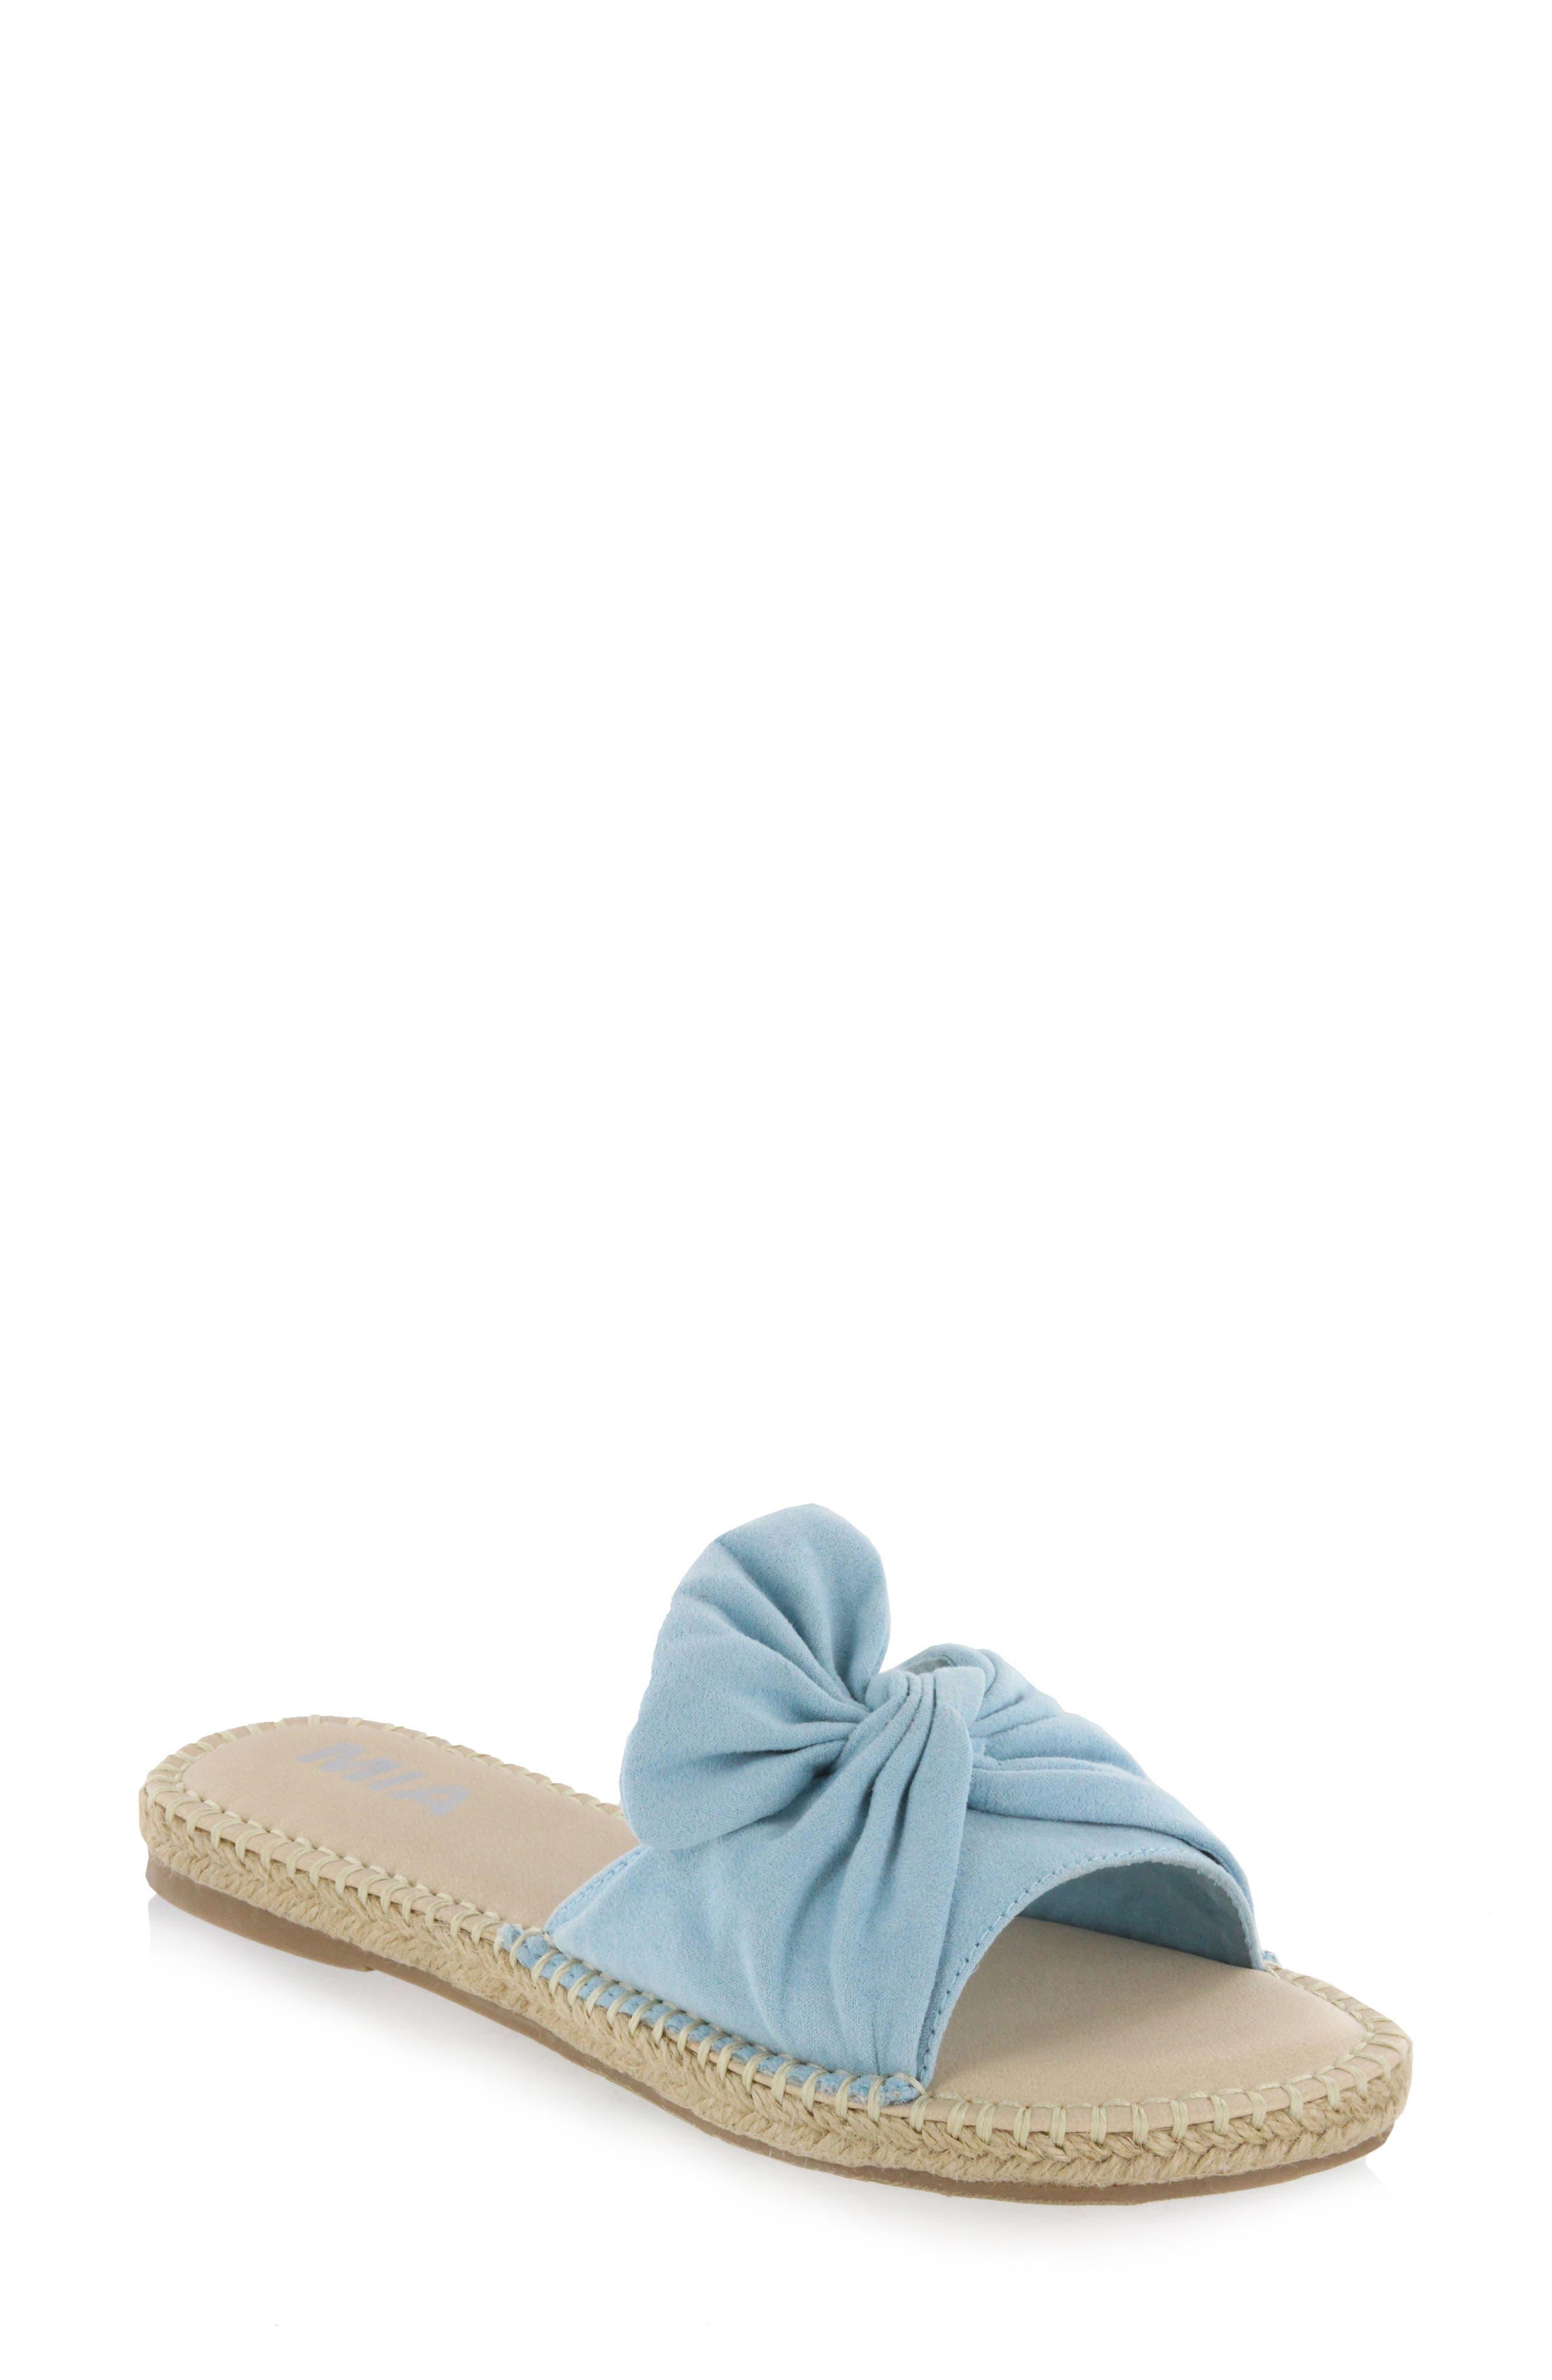 Kensi Knotted Slide Sandal,                             Main thumbnail 3, color,